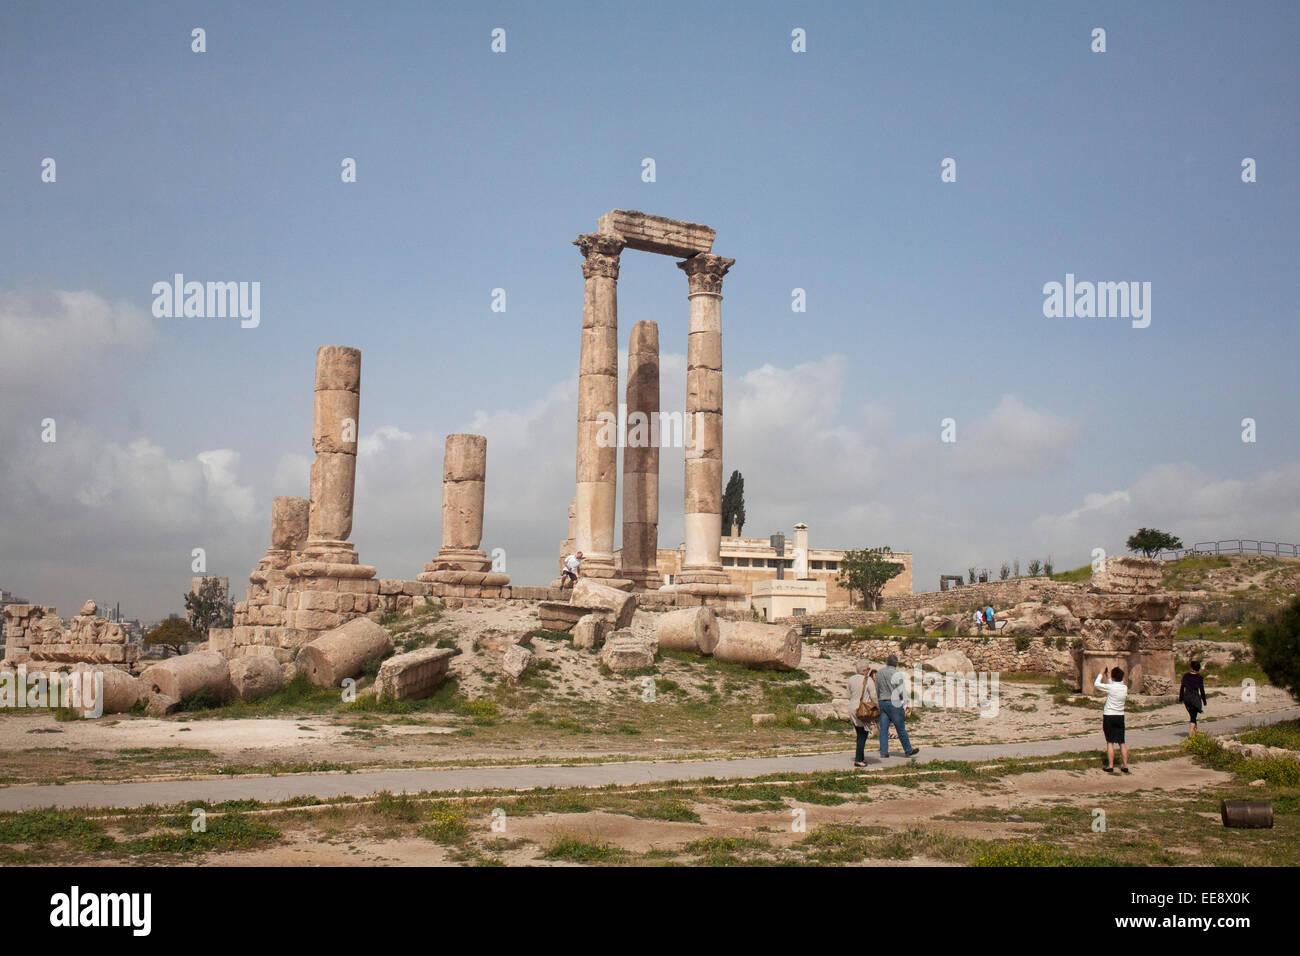 Roman Corinthian Columns at the Temple of Hercules Citadel Hill, Amman Stock Photo